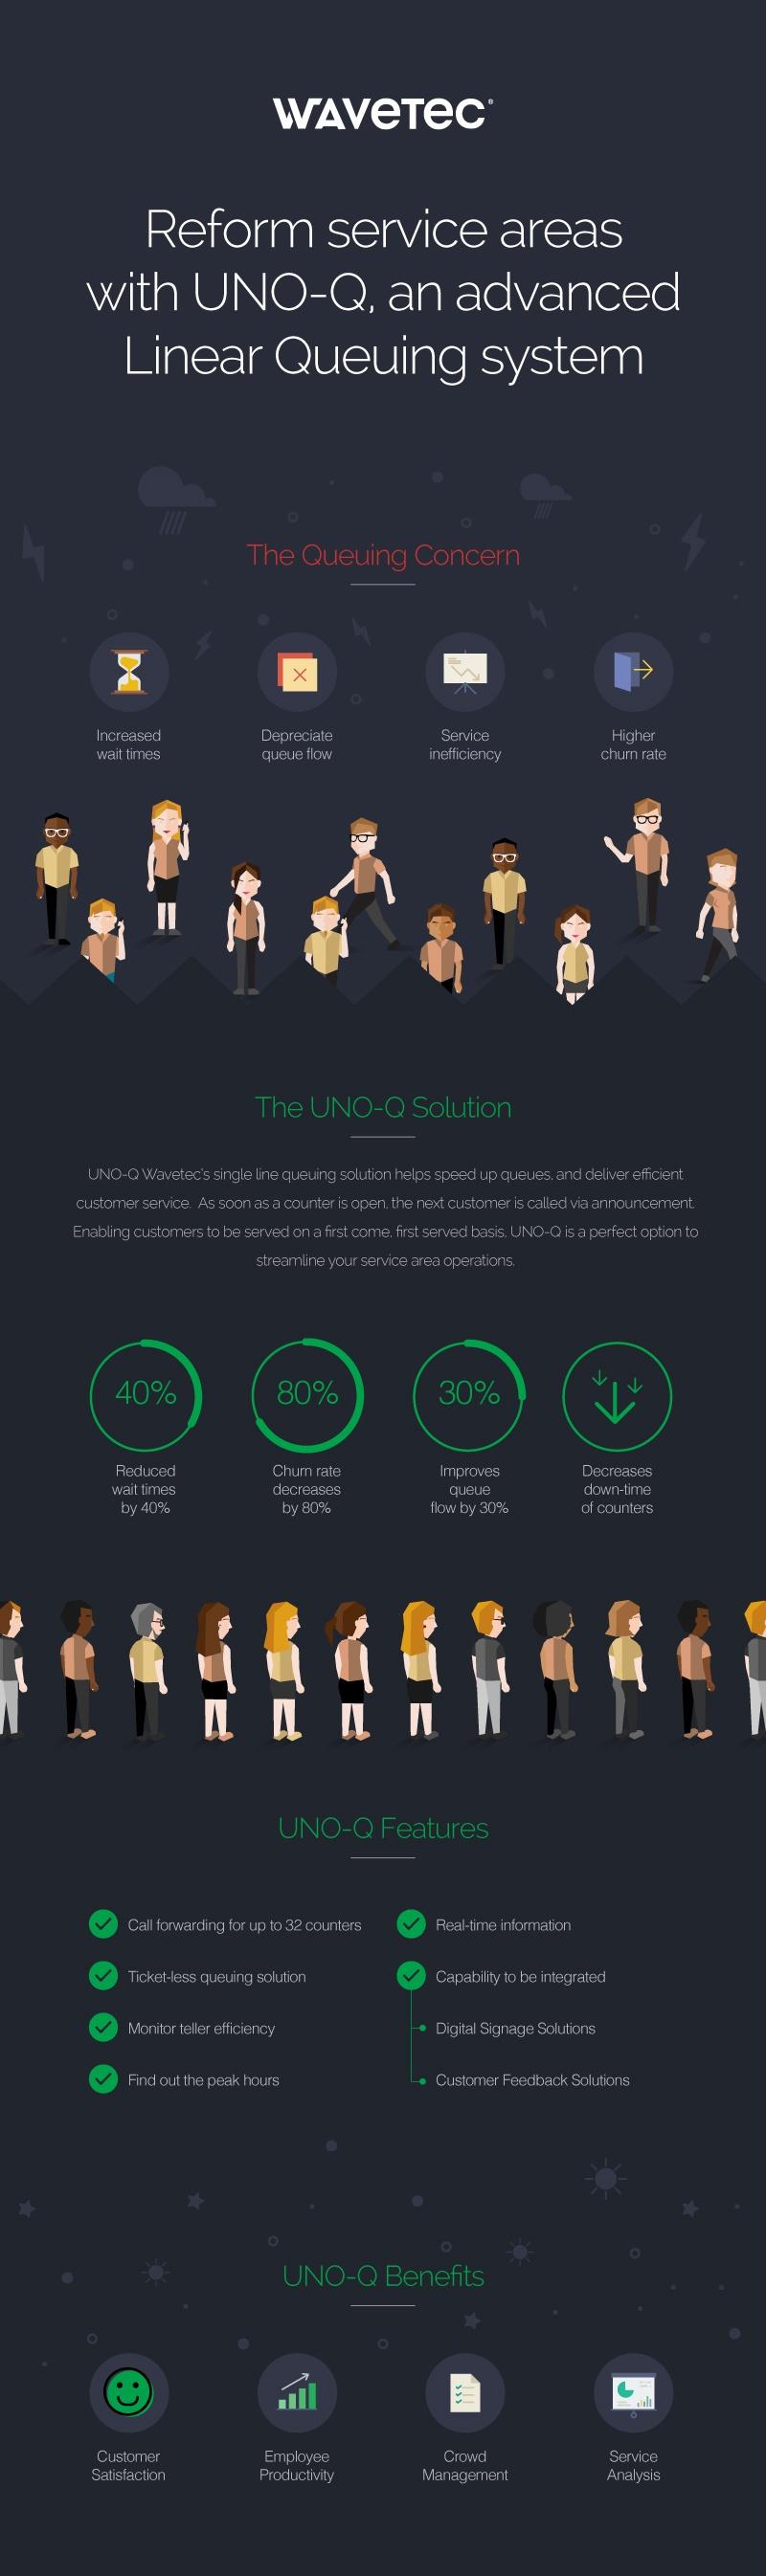 unoq_infographic_3_2.jpg